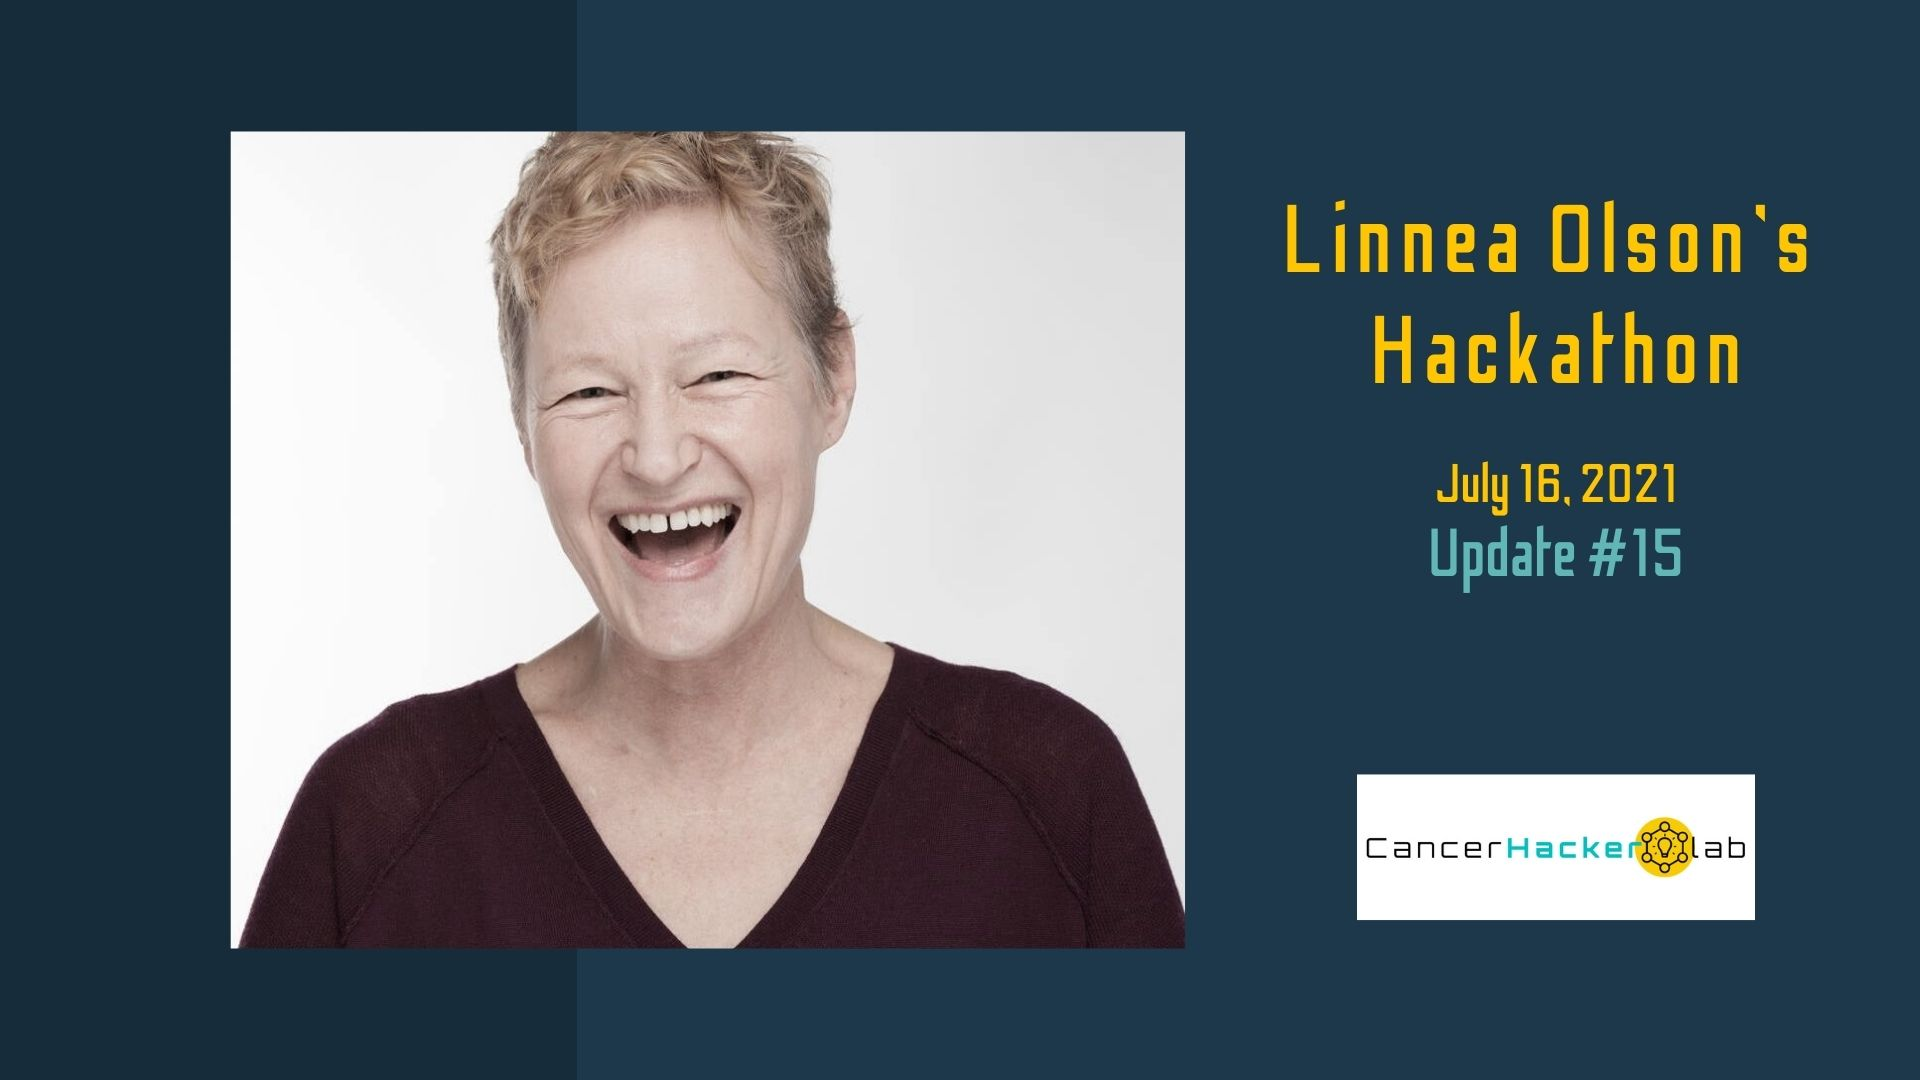 Linnea Olson Update #16